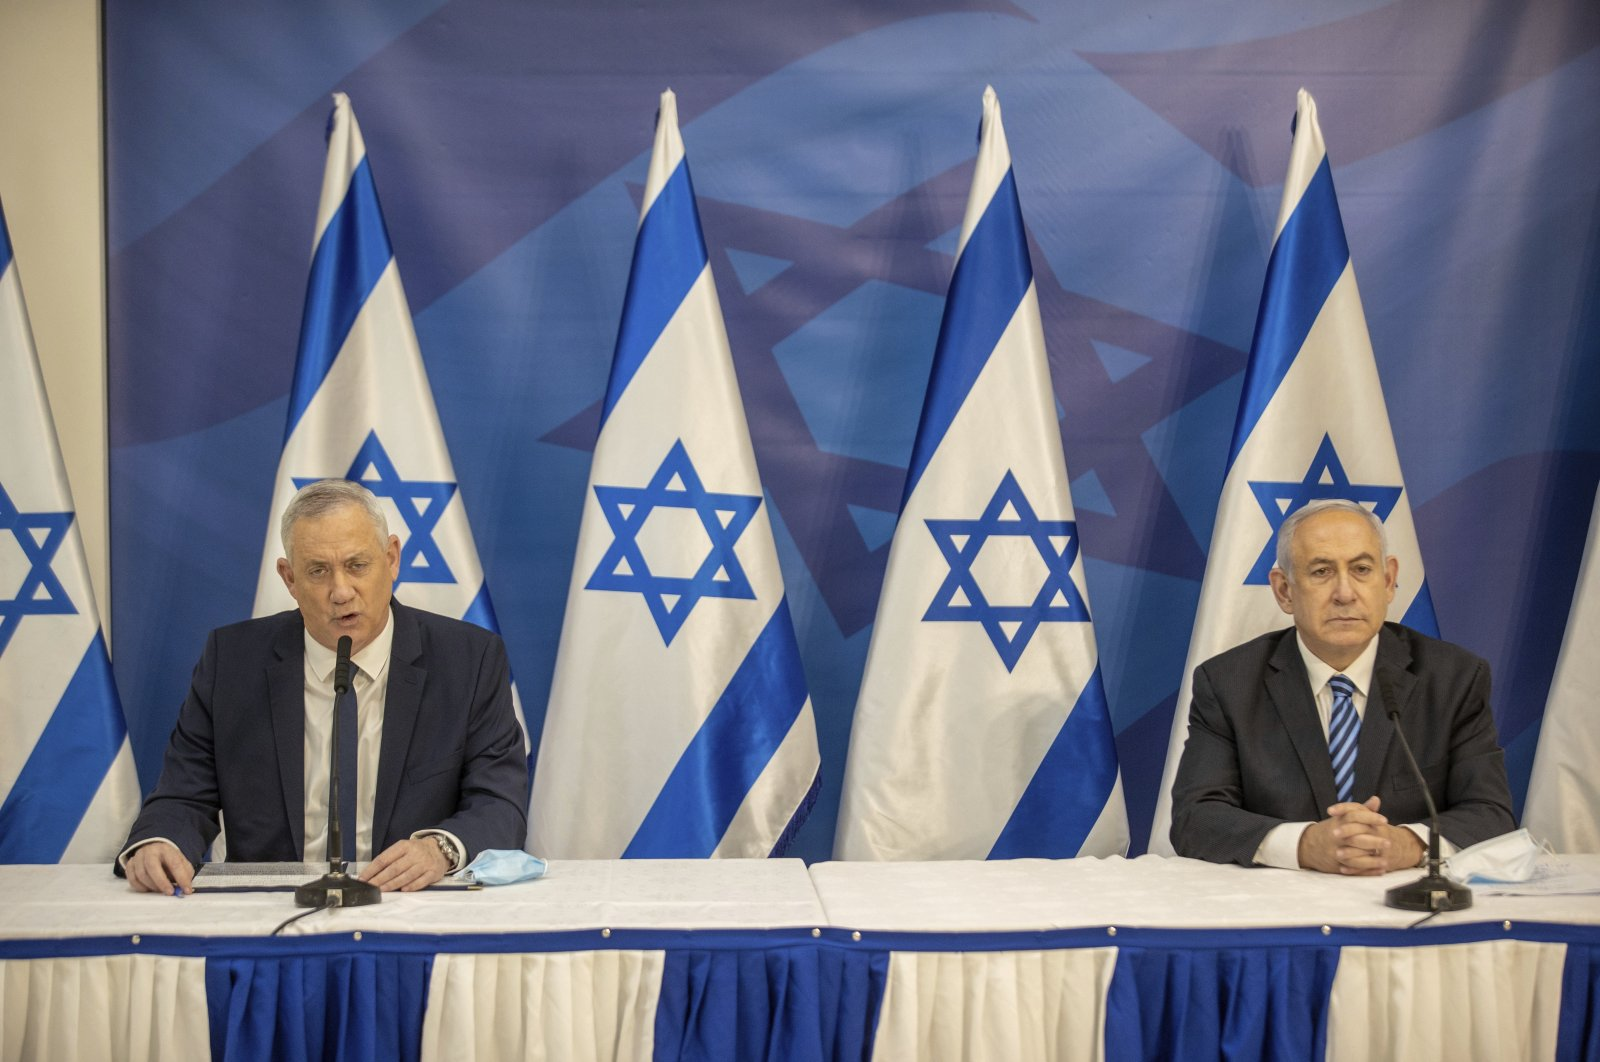 Israeli Prime Minister Benjamin Netanyahu and Israeli Defense Minister Benny Gantz issue a statement at the Israeli Defense Ministry in Tel Aviv, Israel, July 27, 2020. (AP Photo)